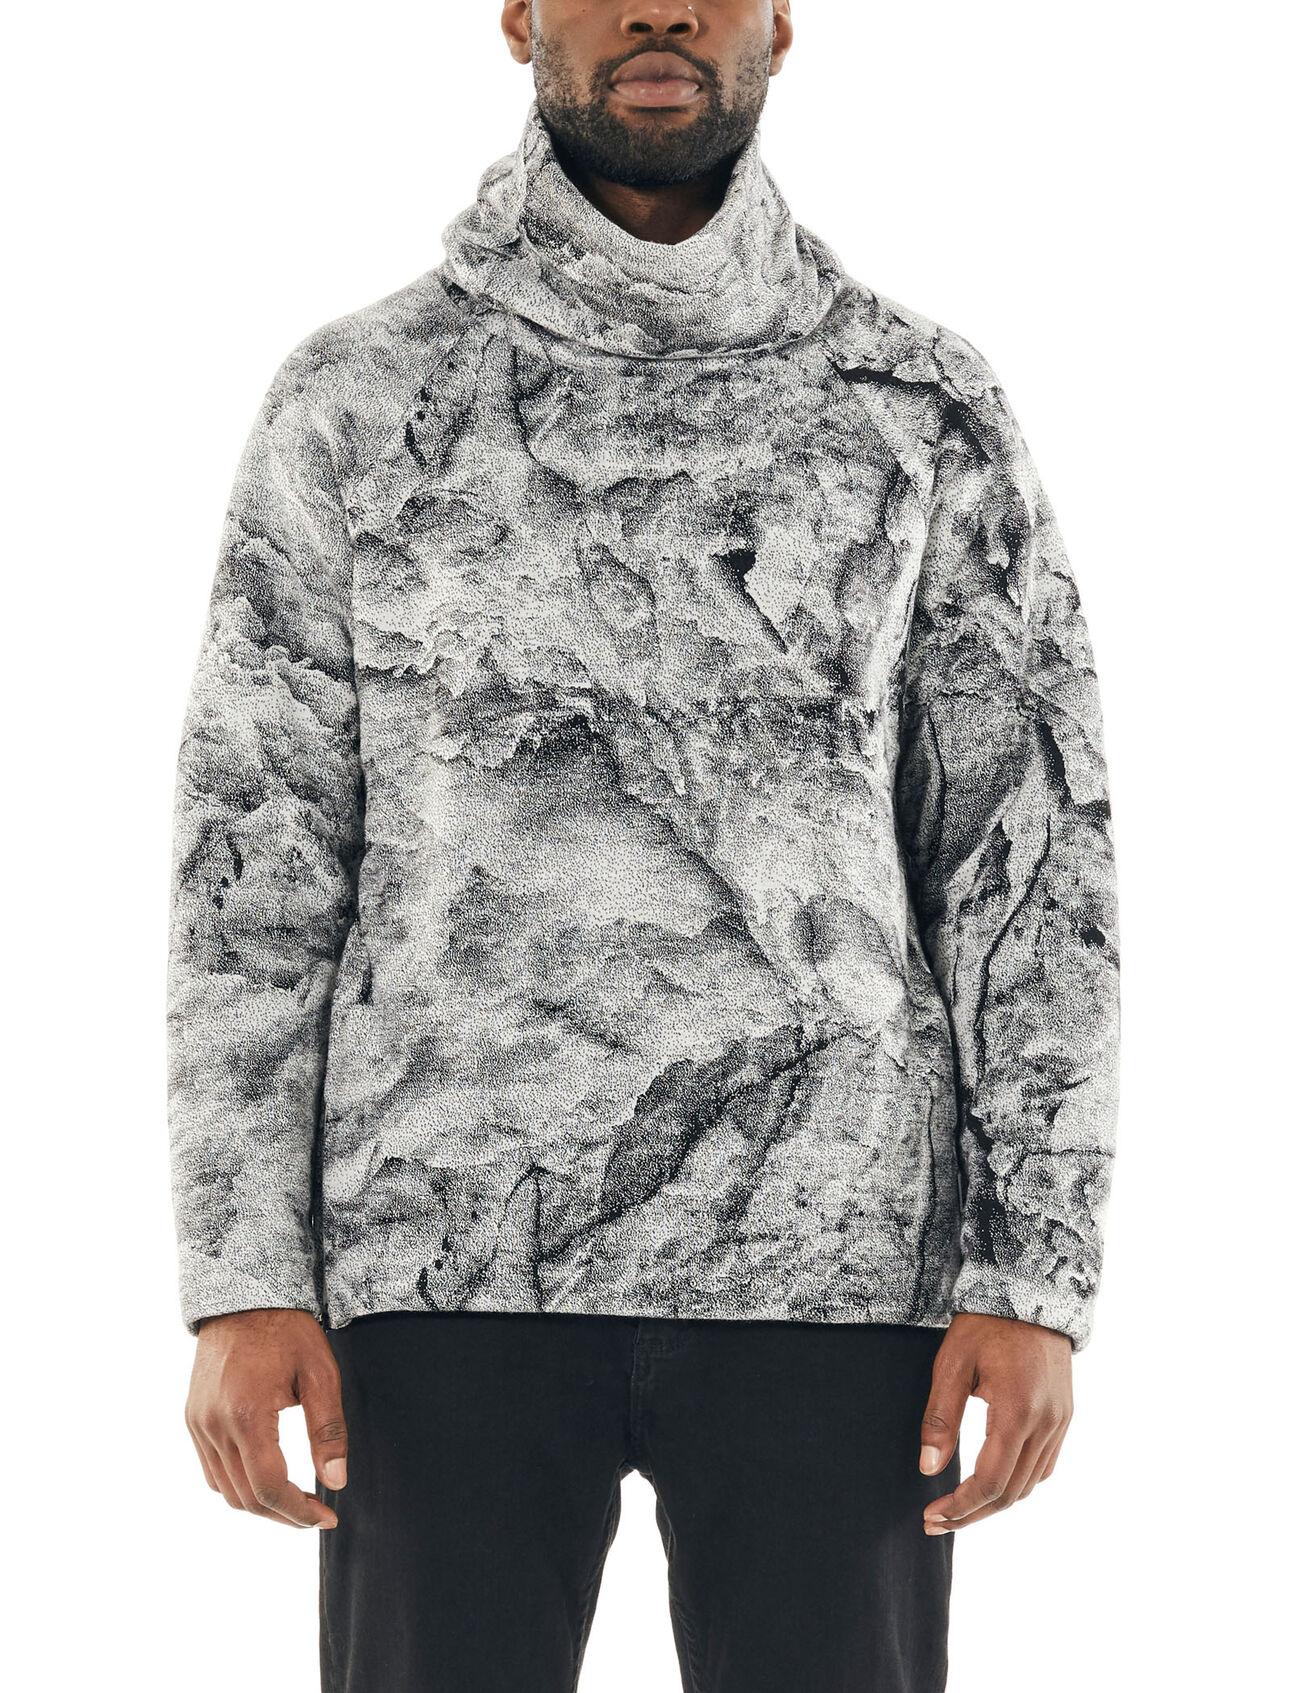 MerinoLoft™ IB Glacier Long Sleeve Pullover Sweater